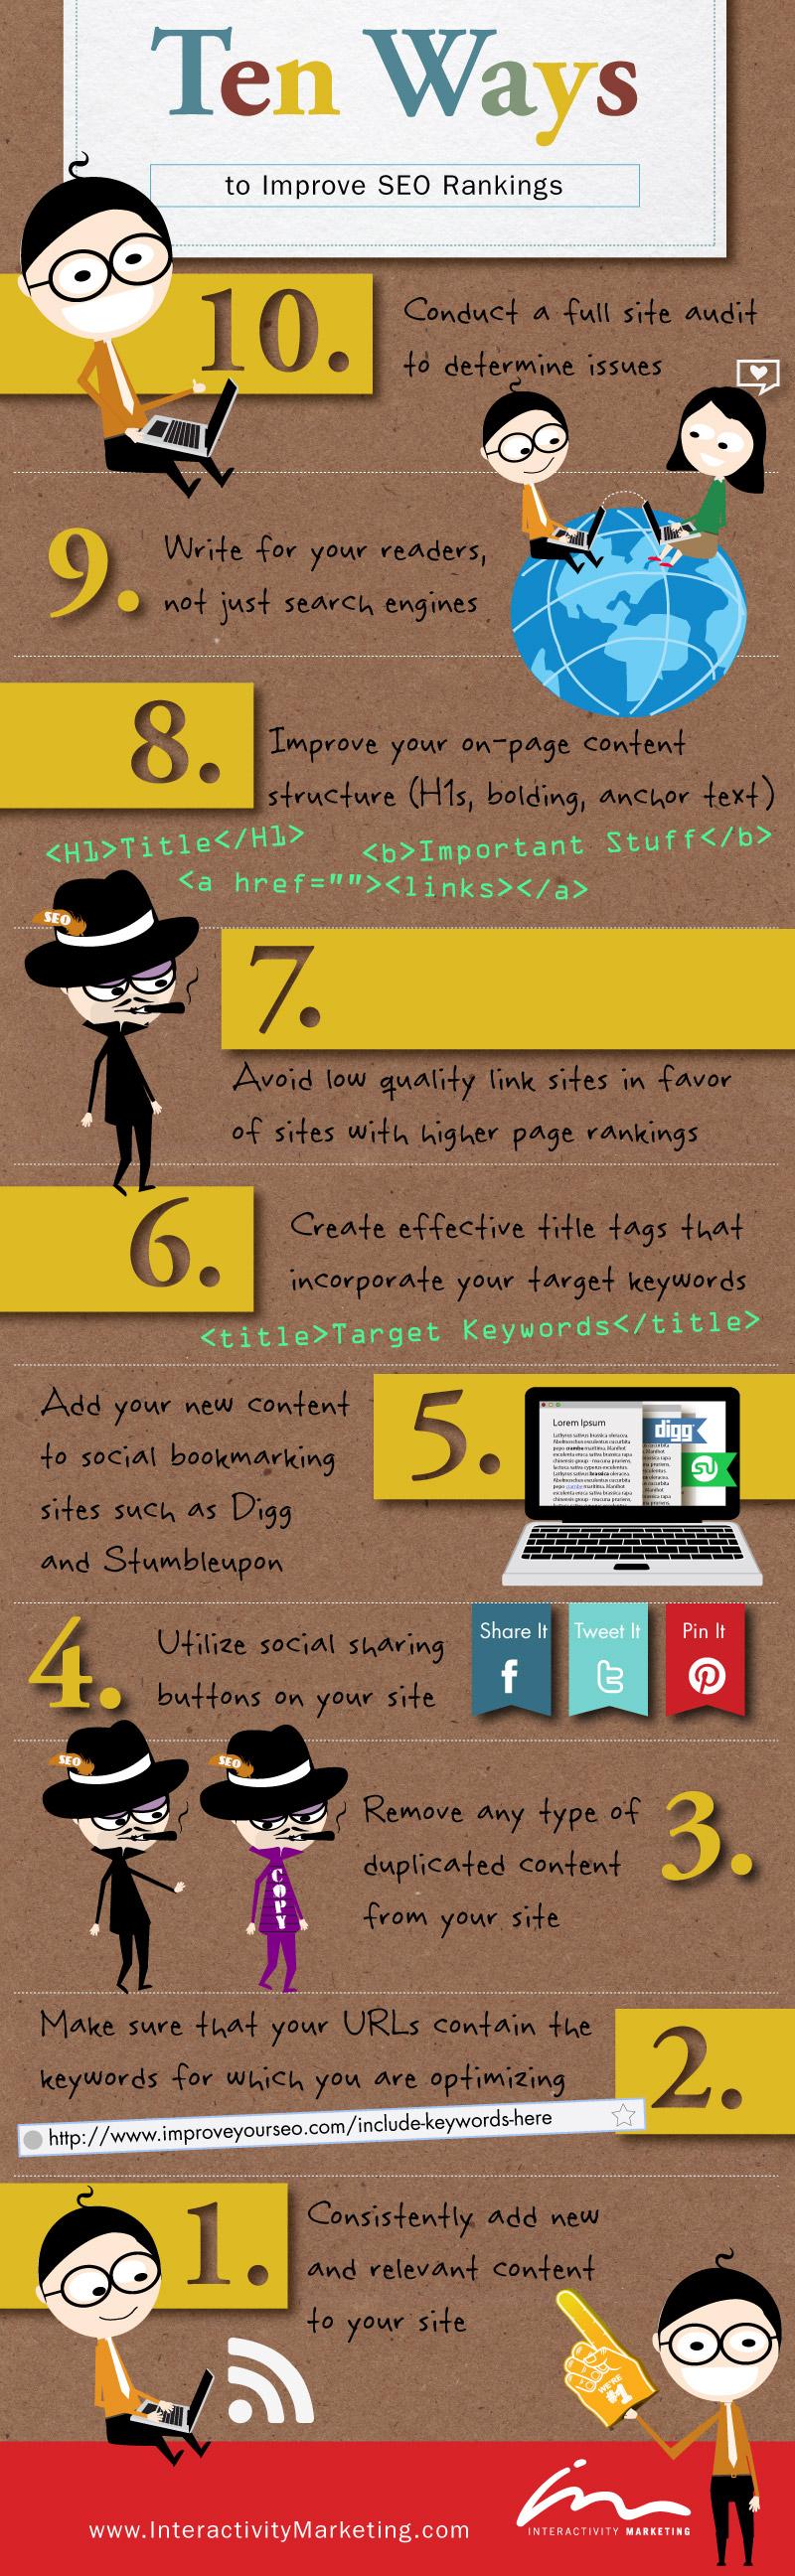 10 maneras mejorar seo